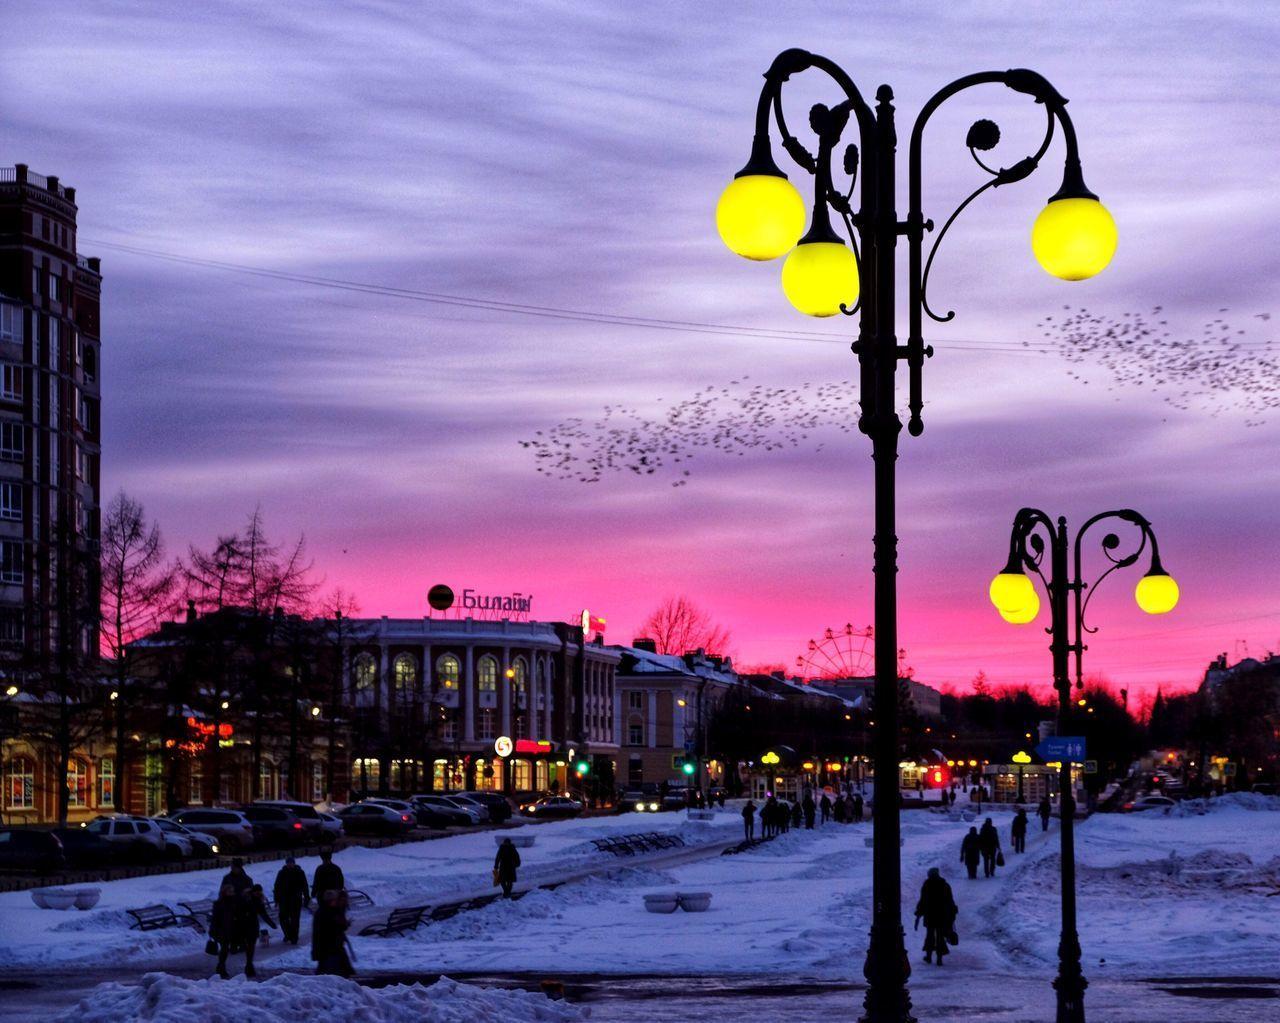 STREET LIGHTS IN WINTER